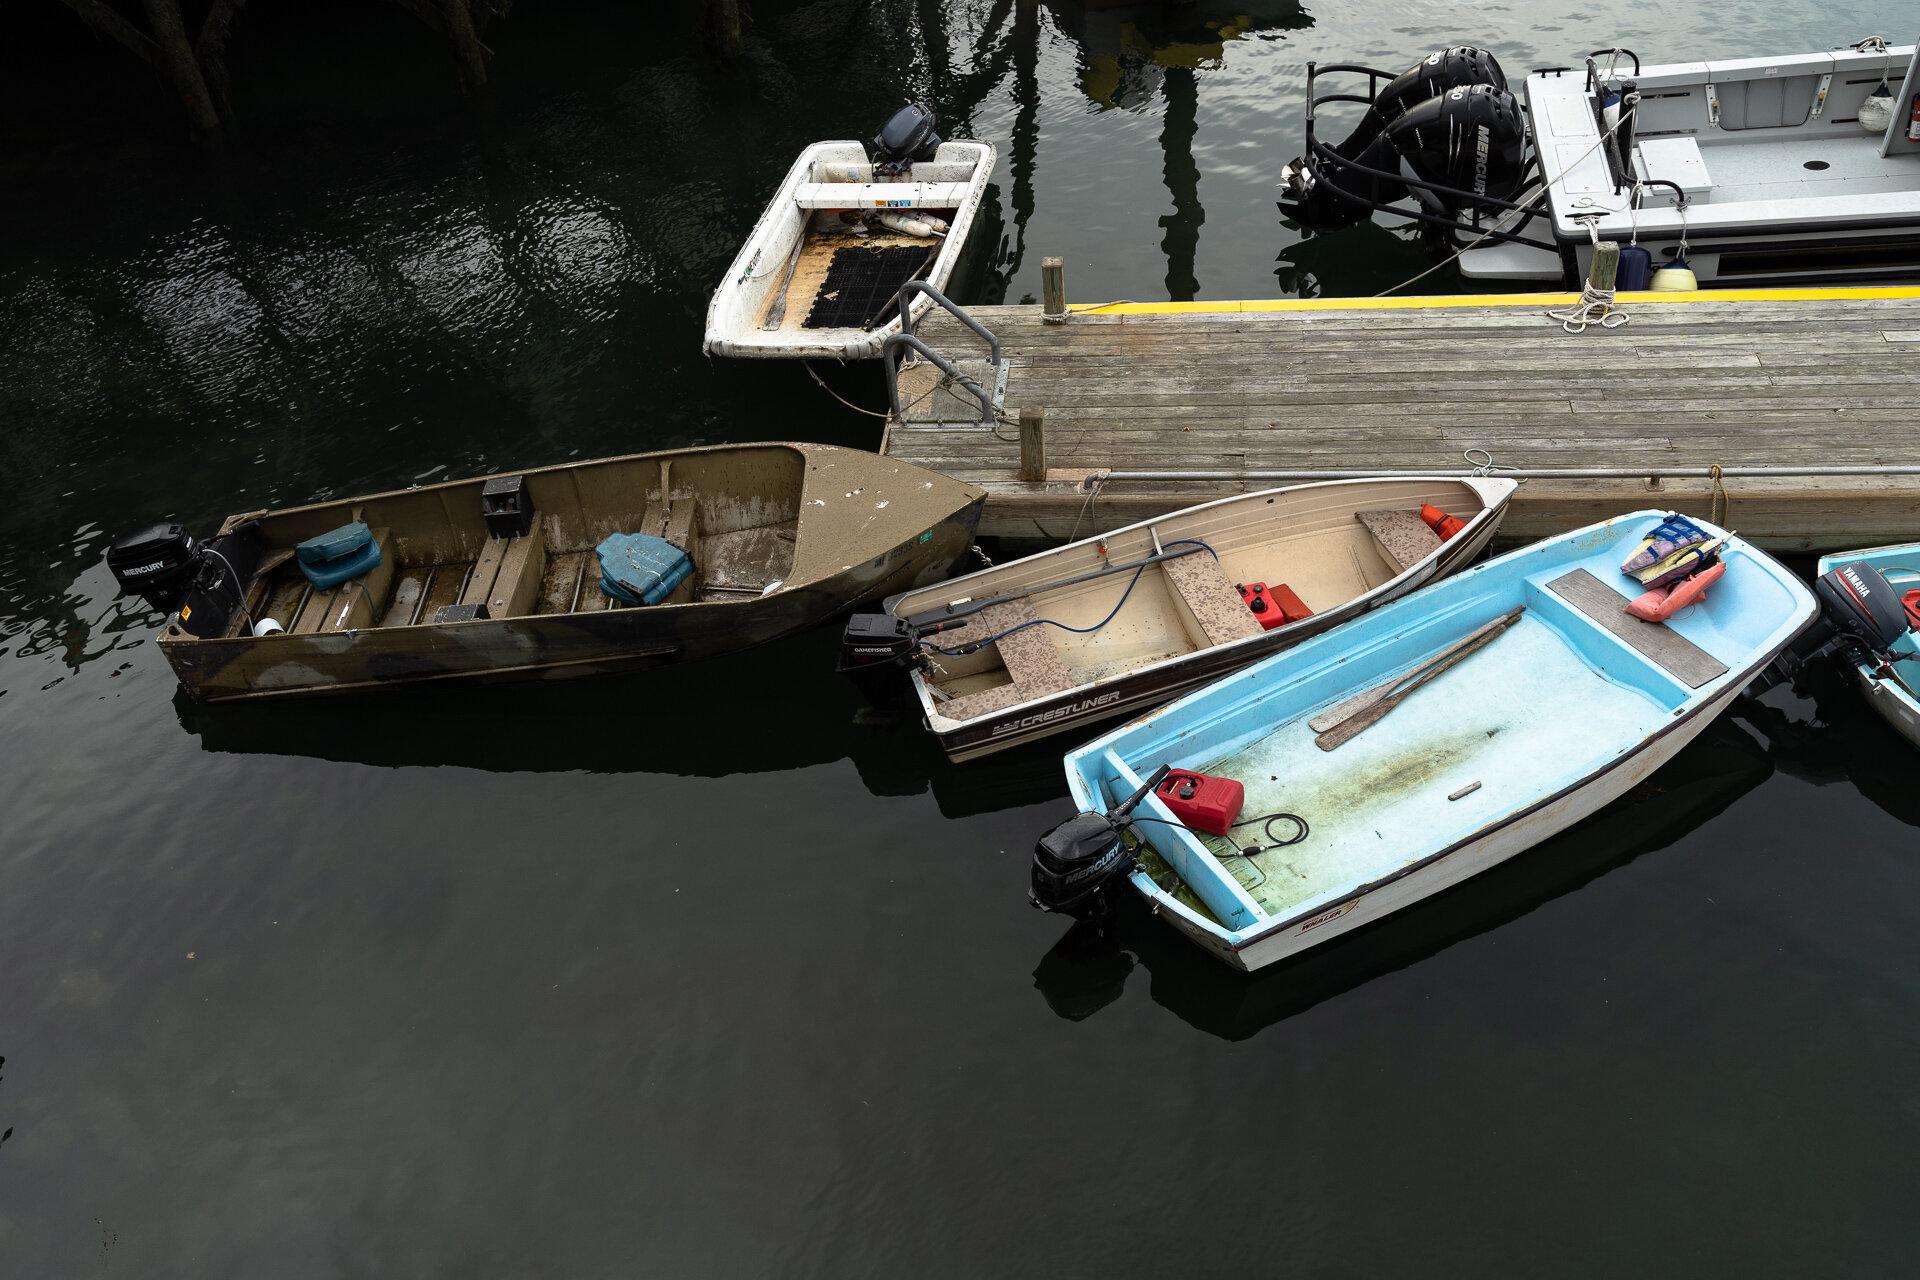 Bar-Harbor-Maine-Sunset-vacation-Kathleen-Kathy-Roberts-Asheville-NC-Photographer-11.jpg